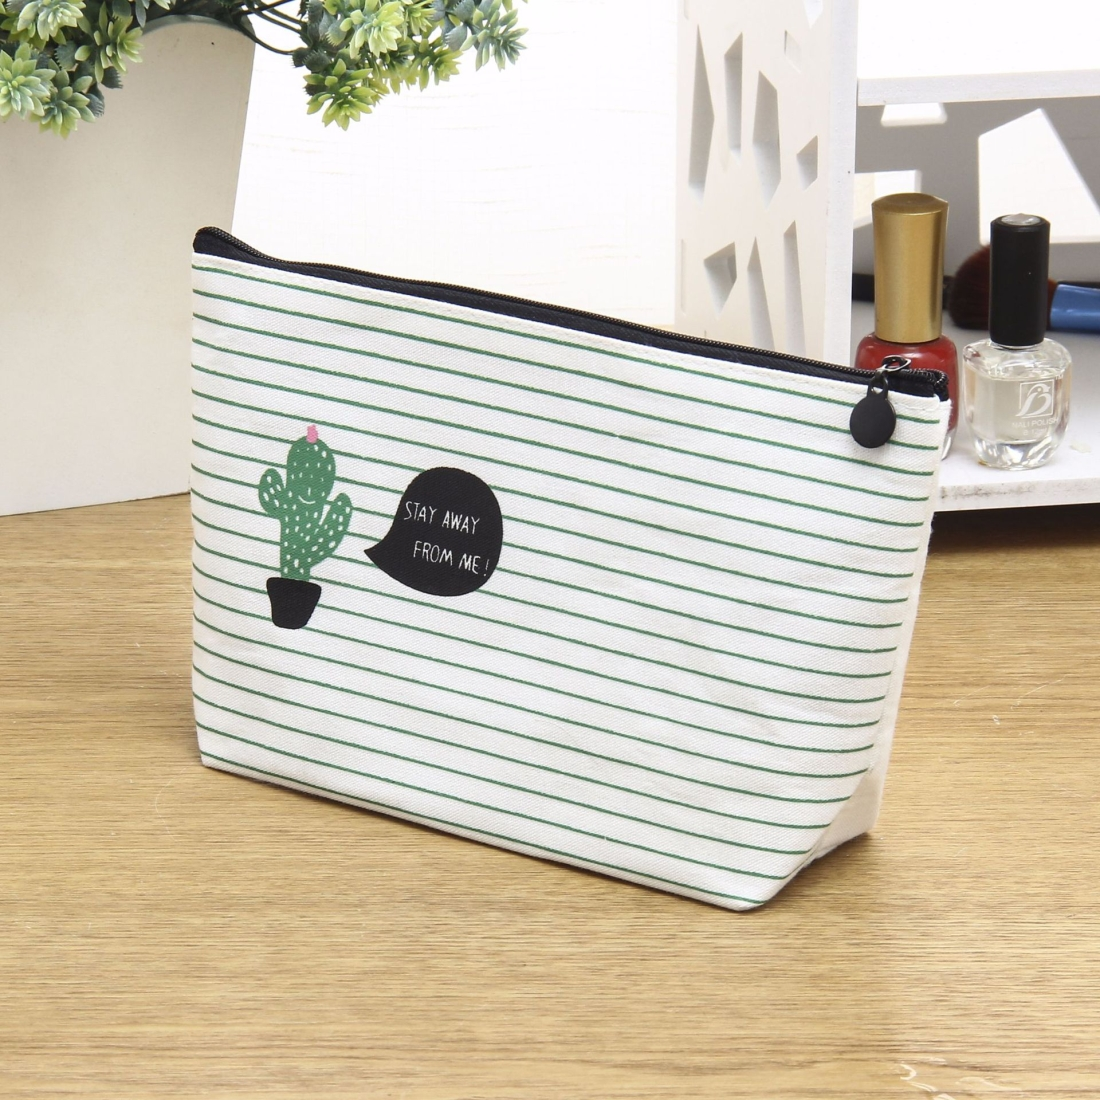 Small Fresh Cactus Cosmetic Bag Multi-Functional Canvas Hand Storage Bag Toiletry Storage Box (Mul cactus)